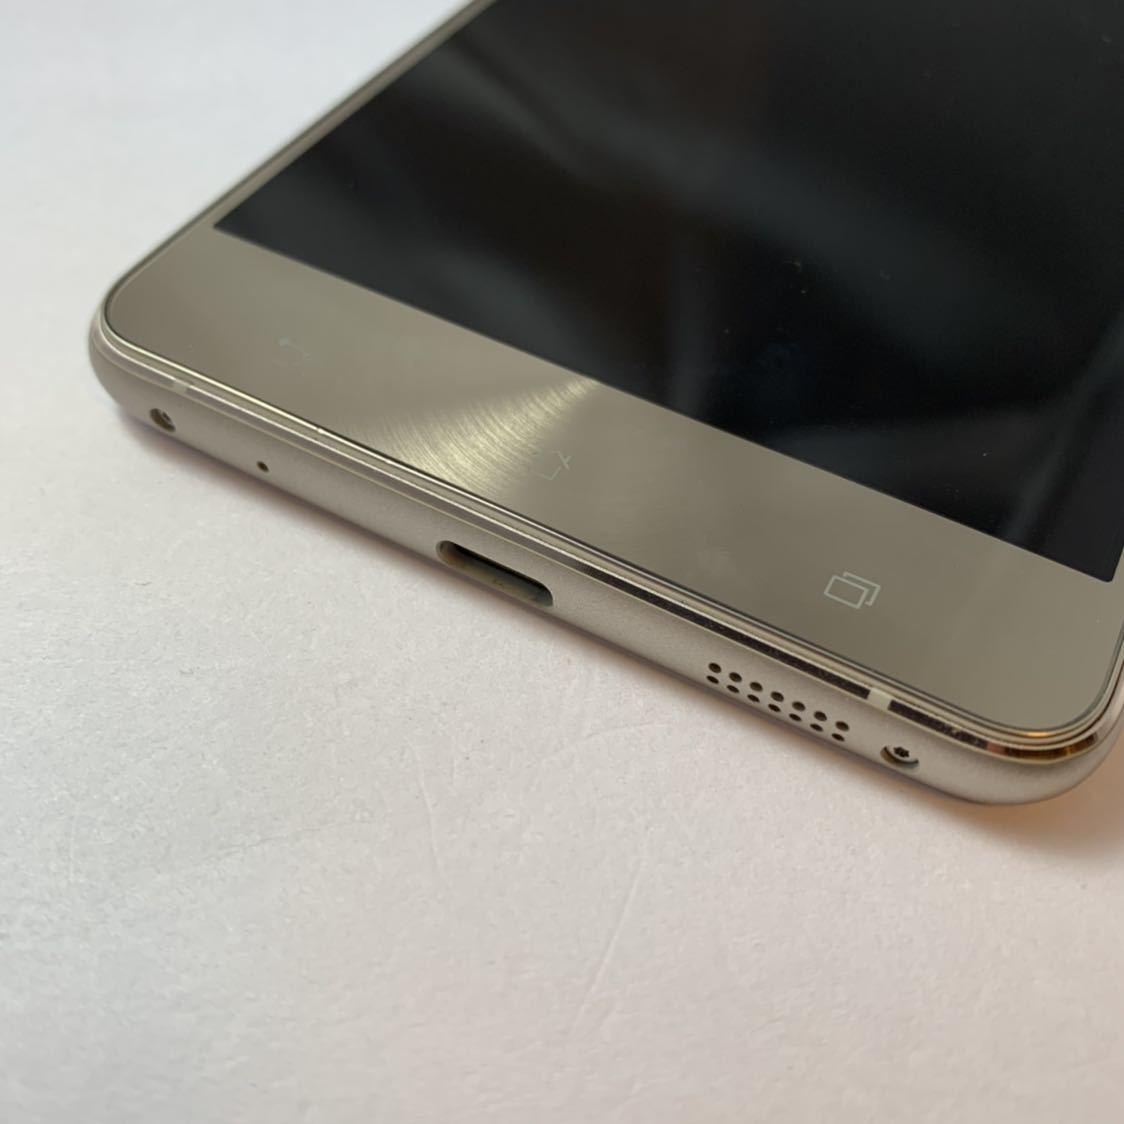 ASUS Zenfone 3 Deluxe 5.5 ZS550KL 64GB SIMフリー 本体 Z01FD ゴールド 海外版_画像4